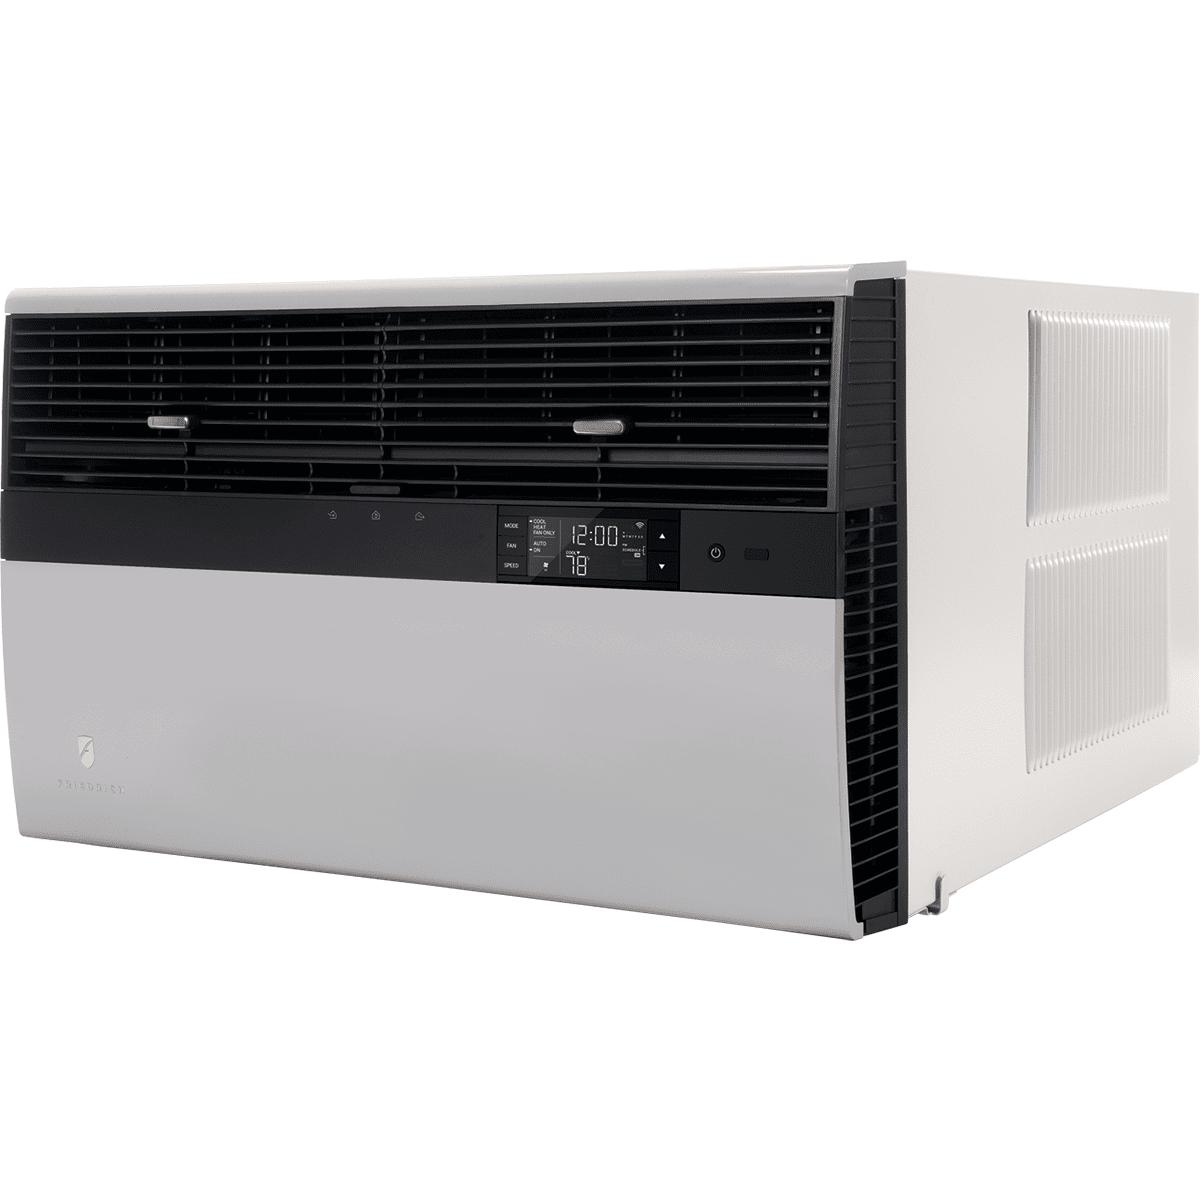 Friedrich Kuhl 36,000 BTU Commercial Window Air Conditioner